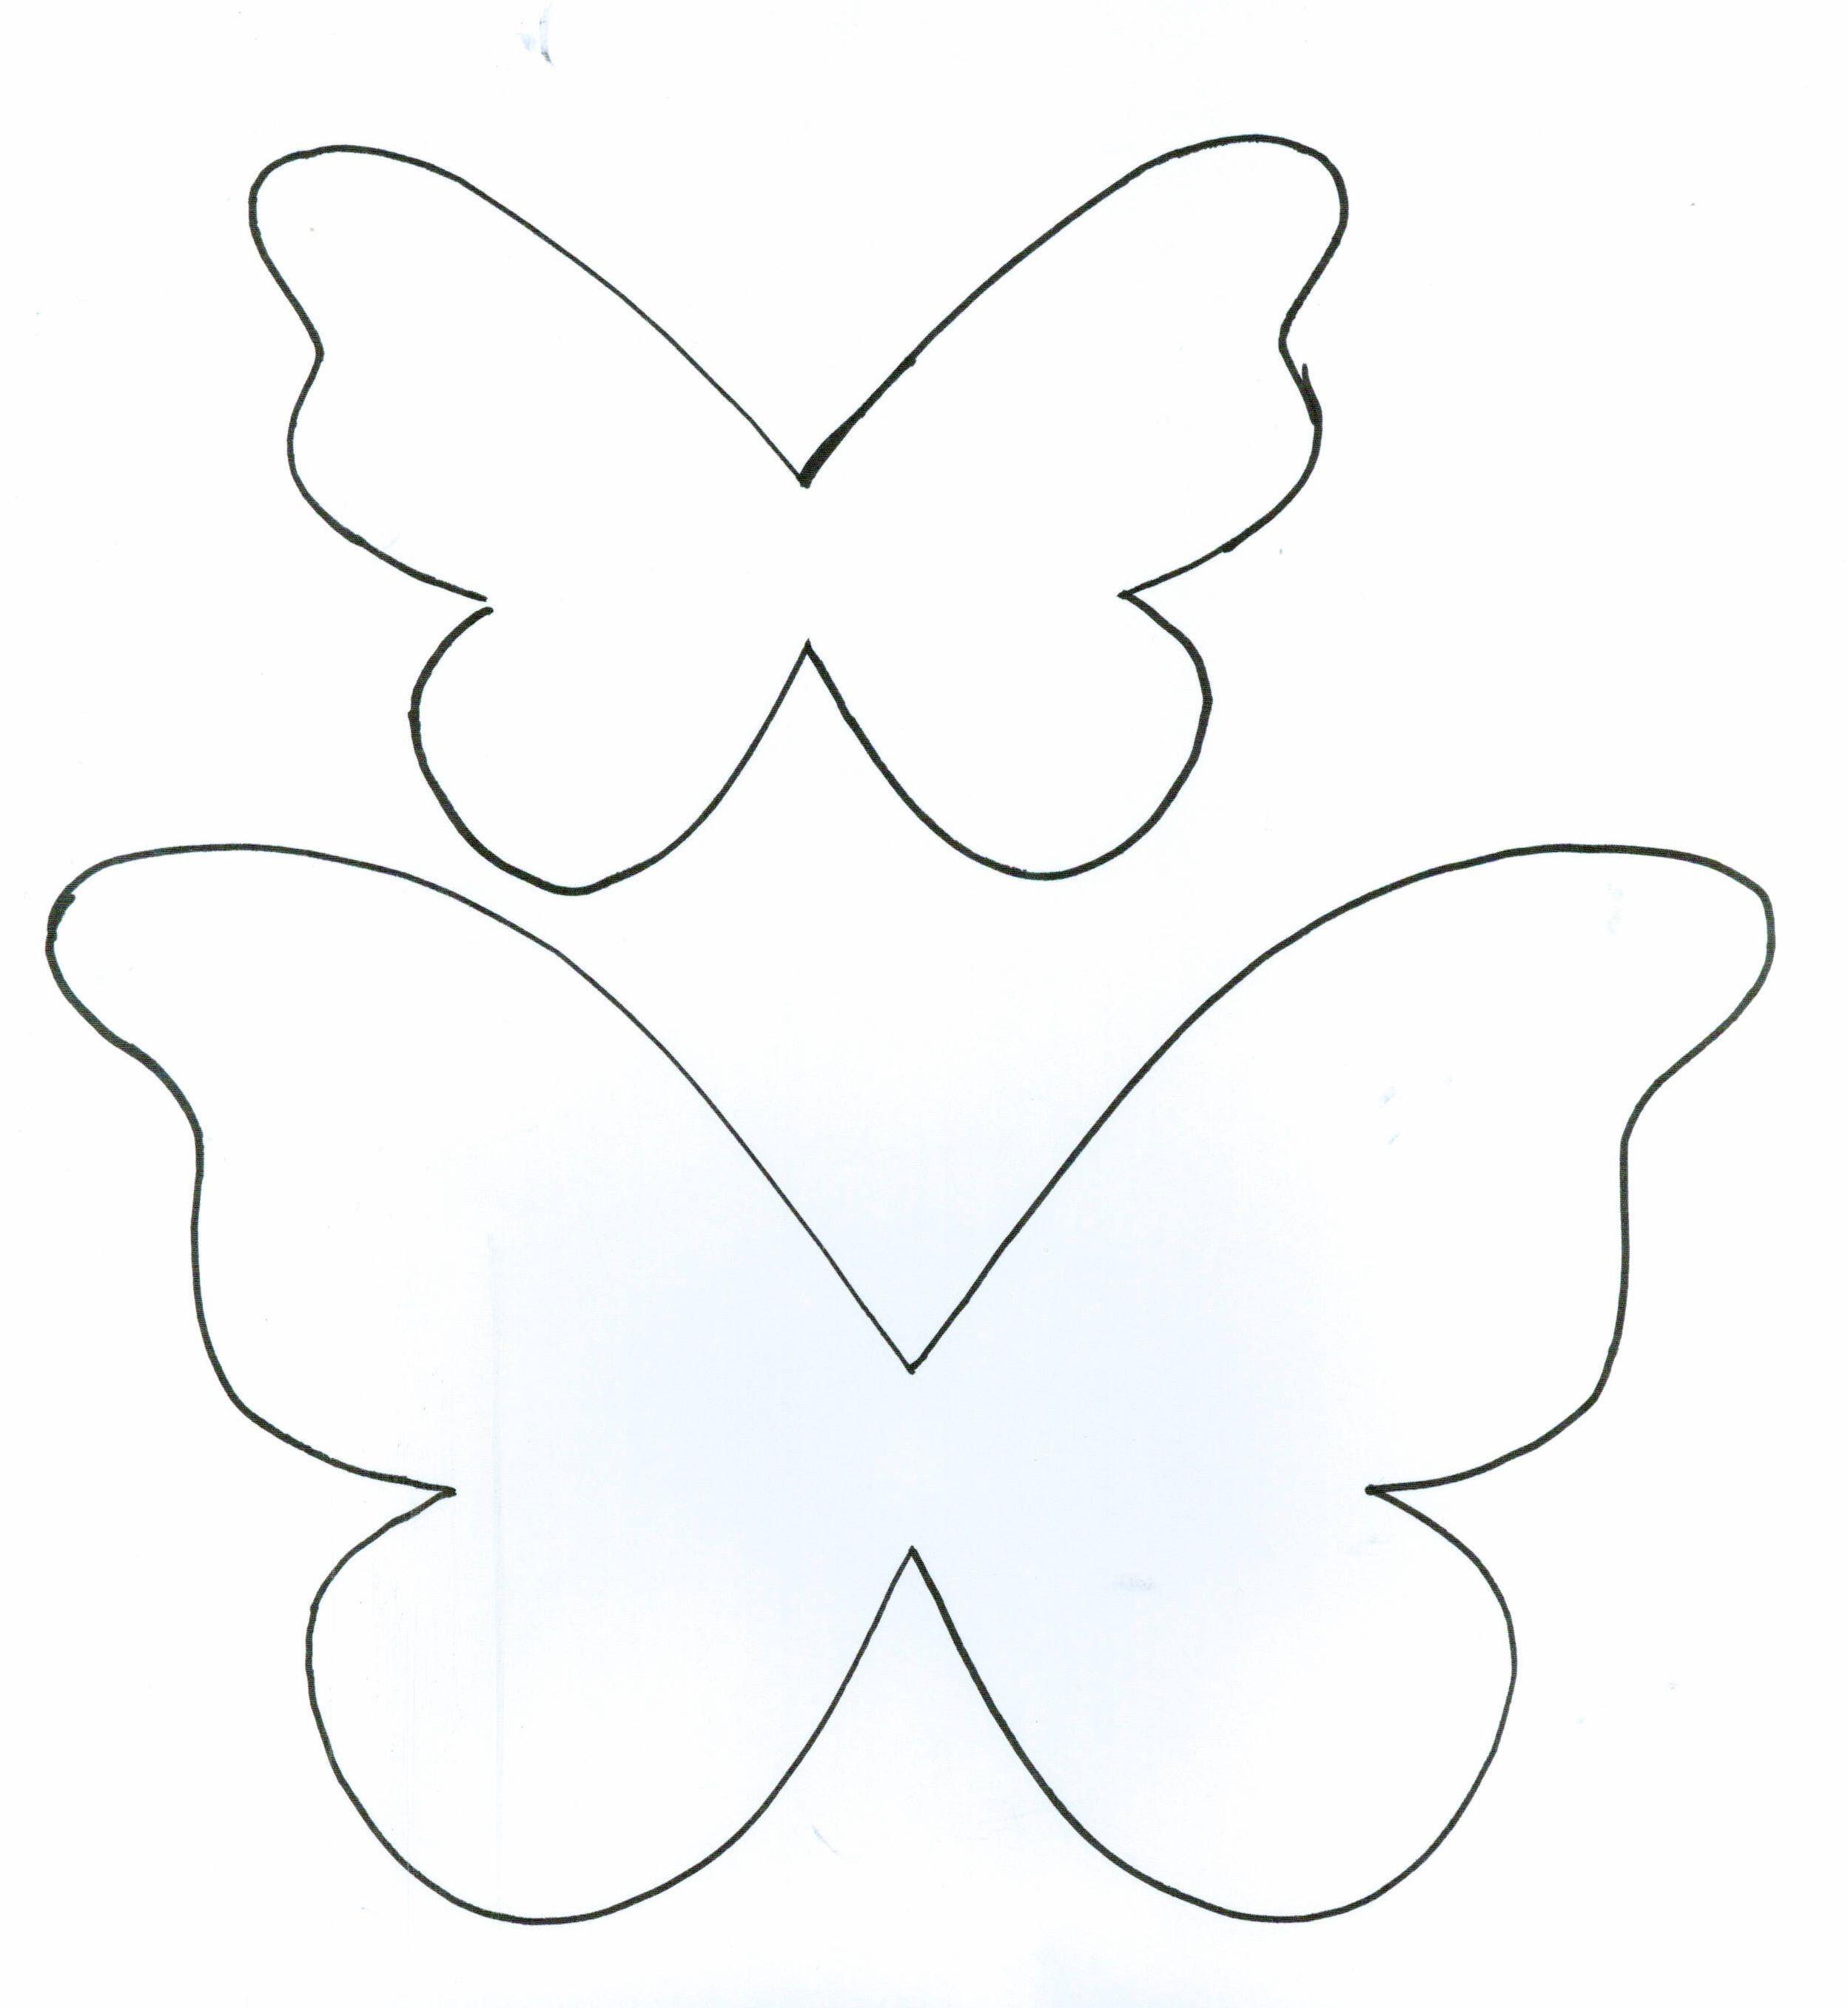 mariposa | Printables | Pinterest | Mariposas, Mariposas de papel y ...